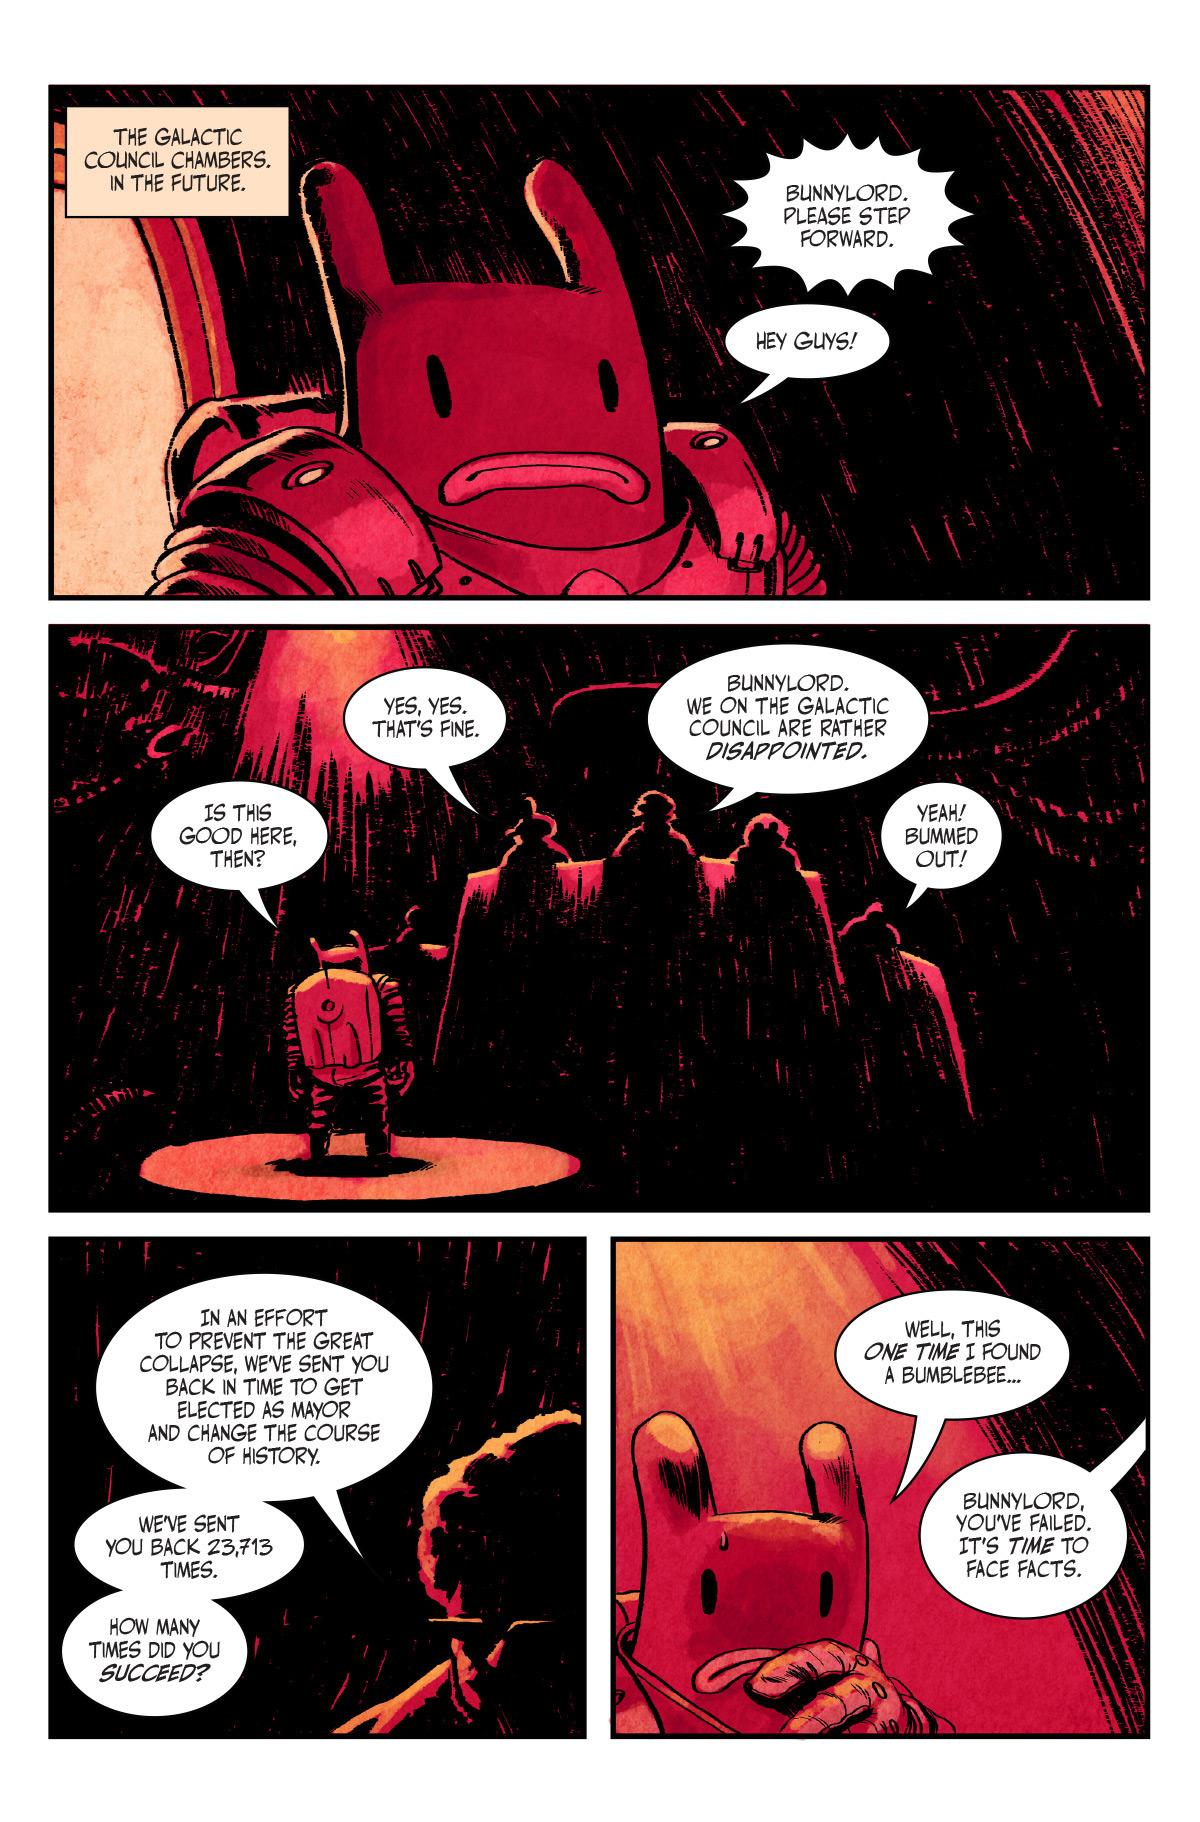 Not a Hero - Key Art and Comic Book